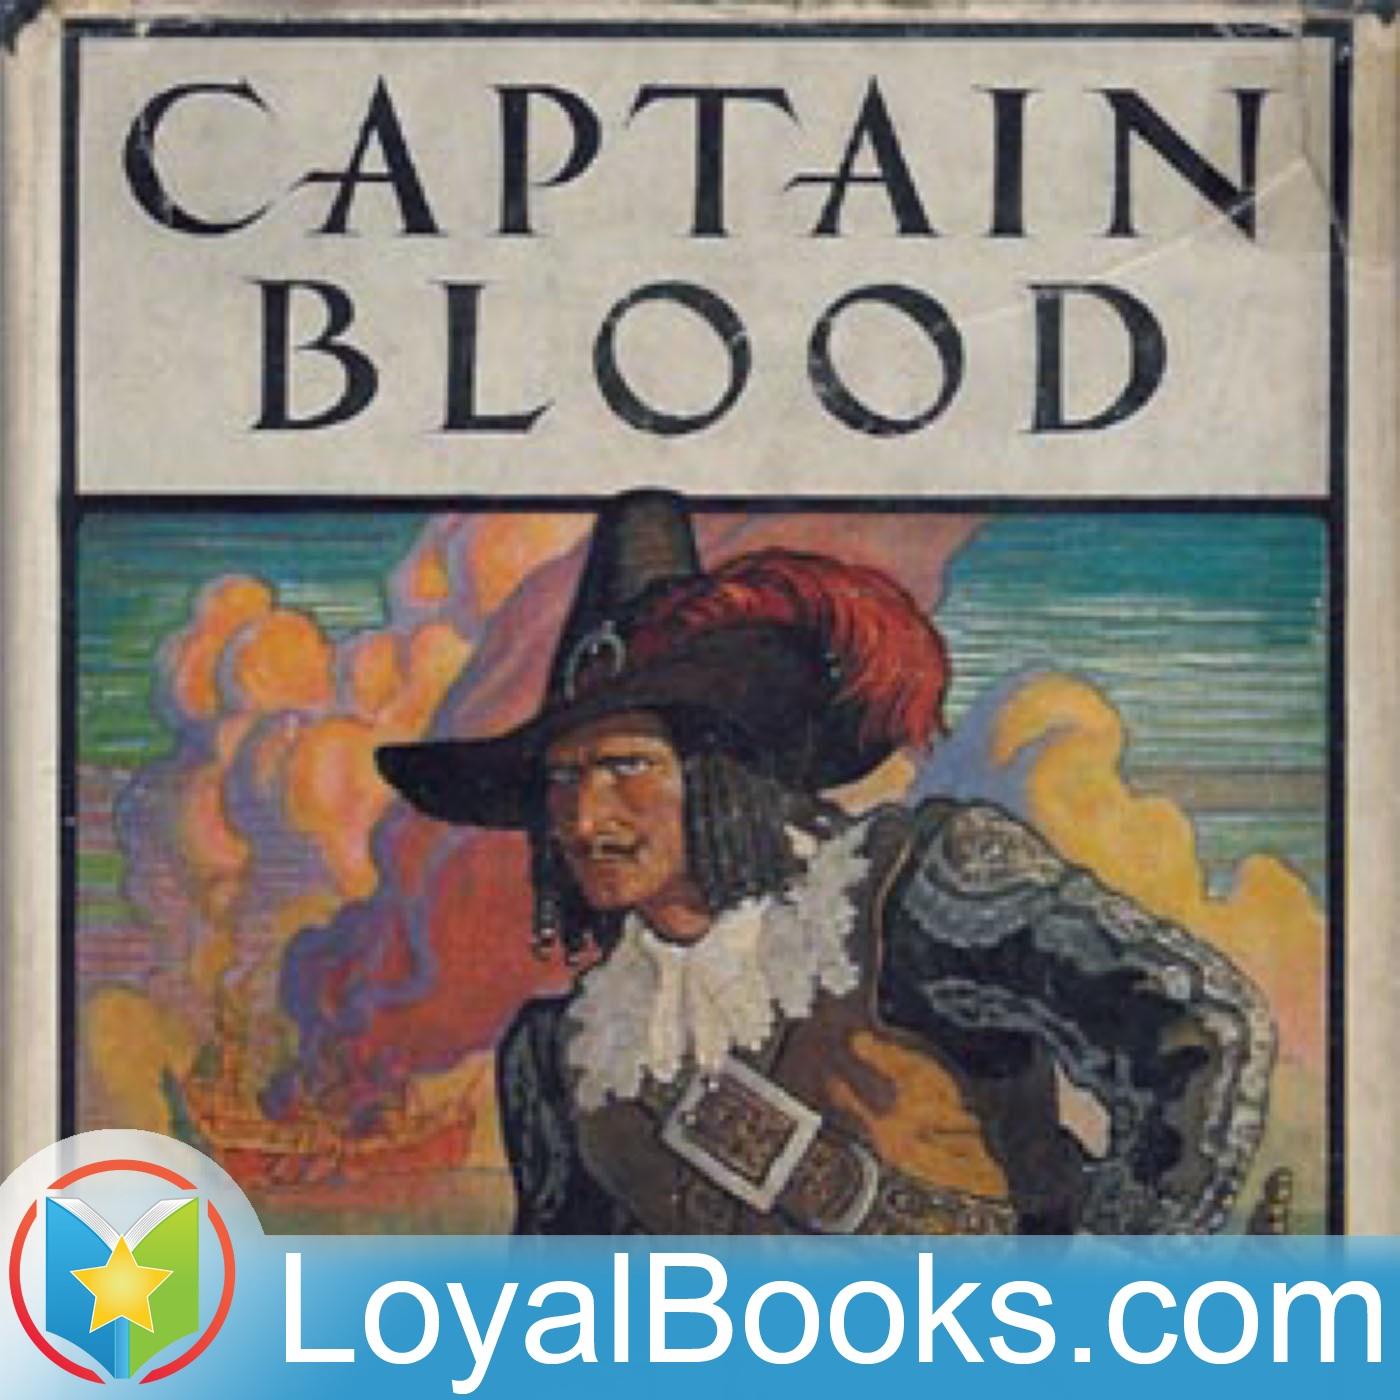 <![CDATA[Captain Blood by Rafael Sabatini]]>